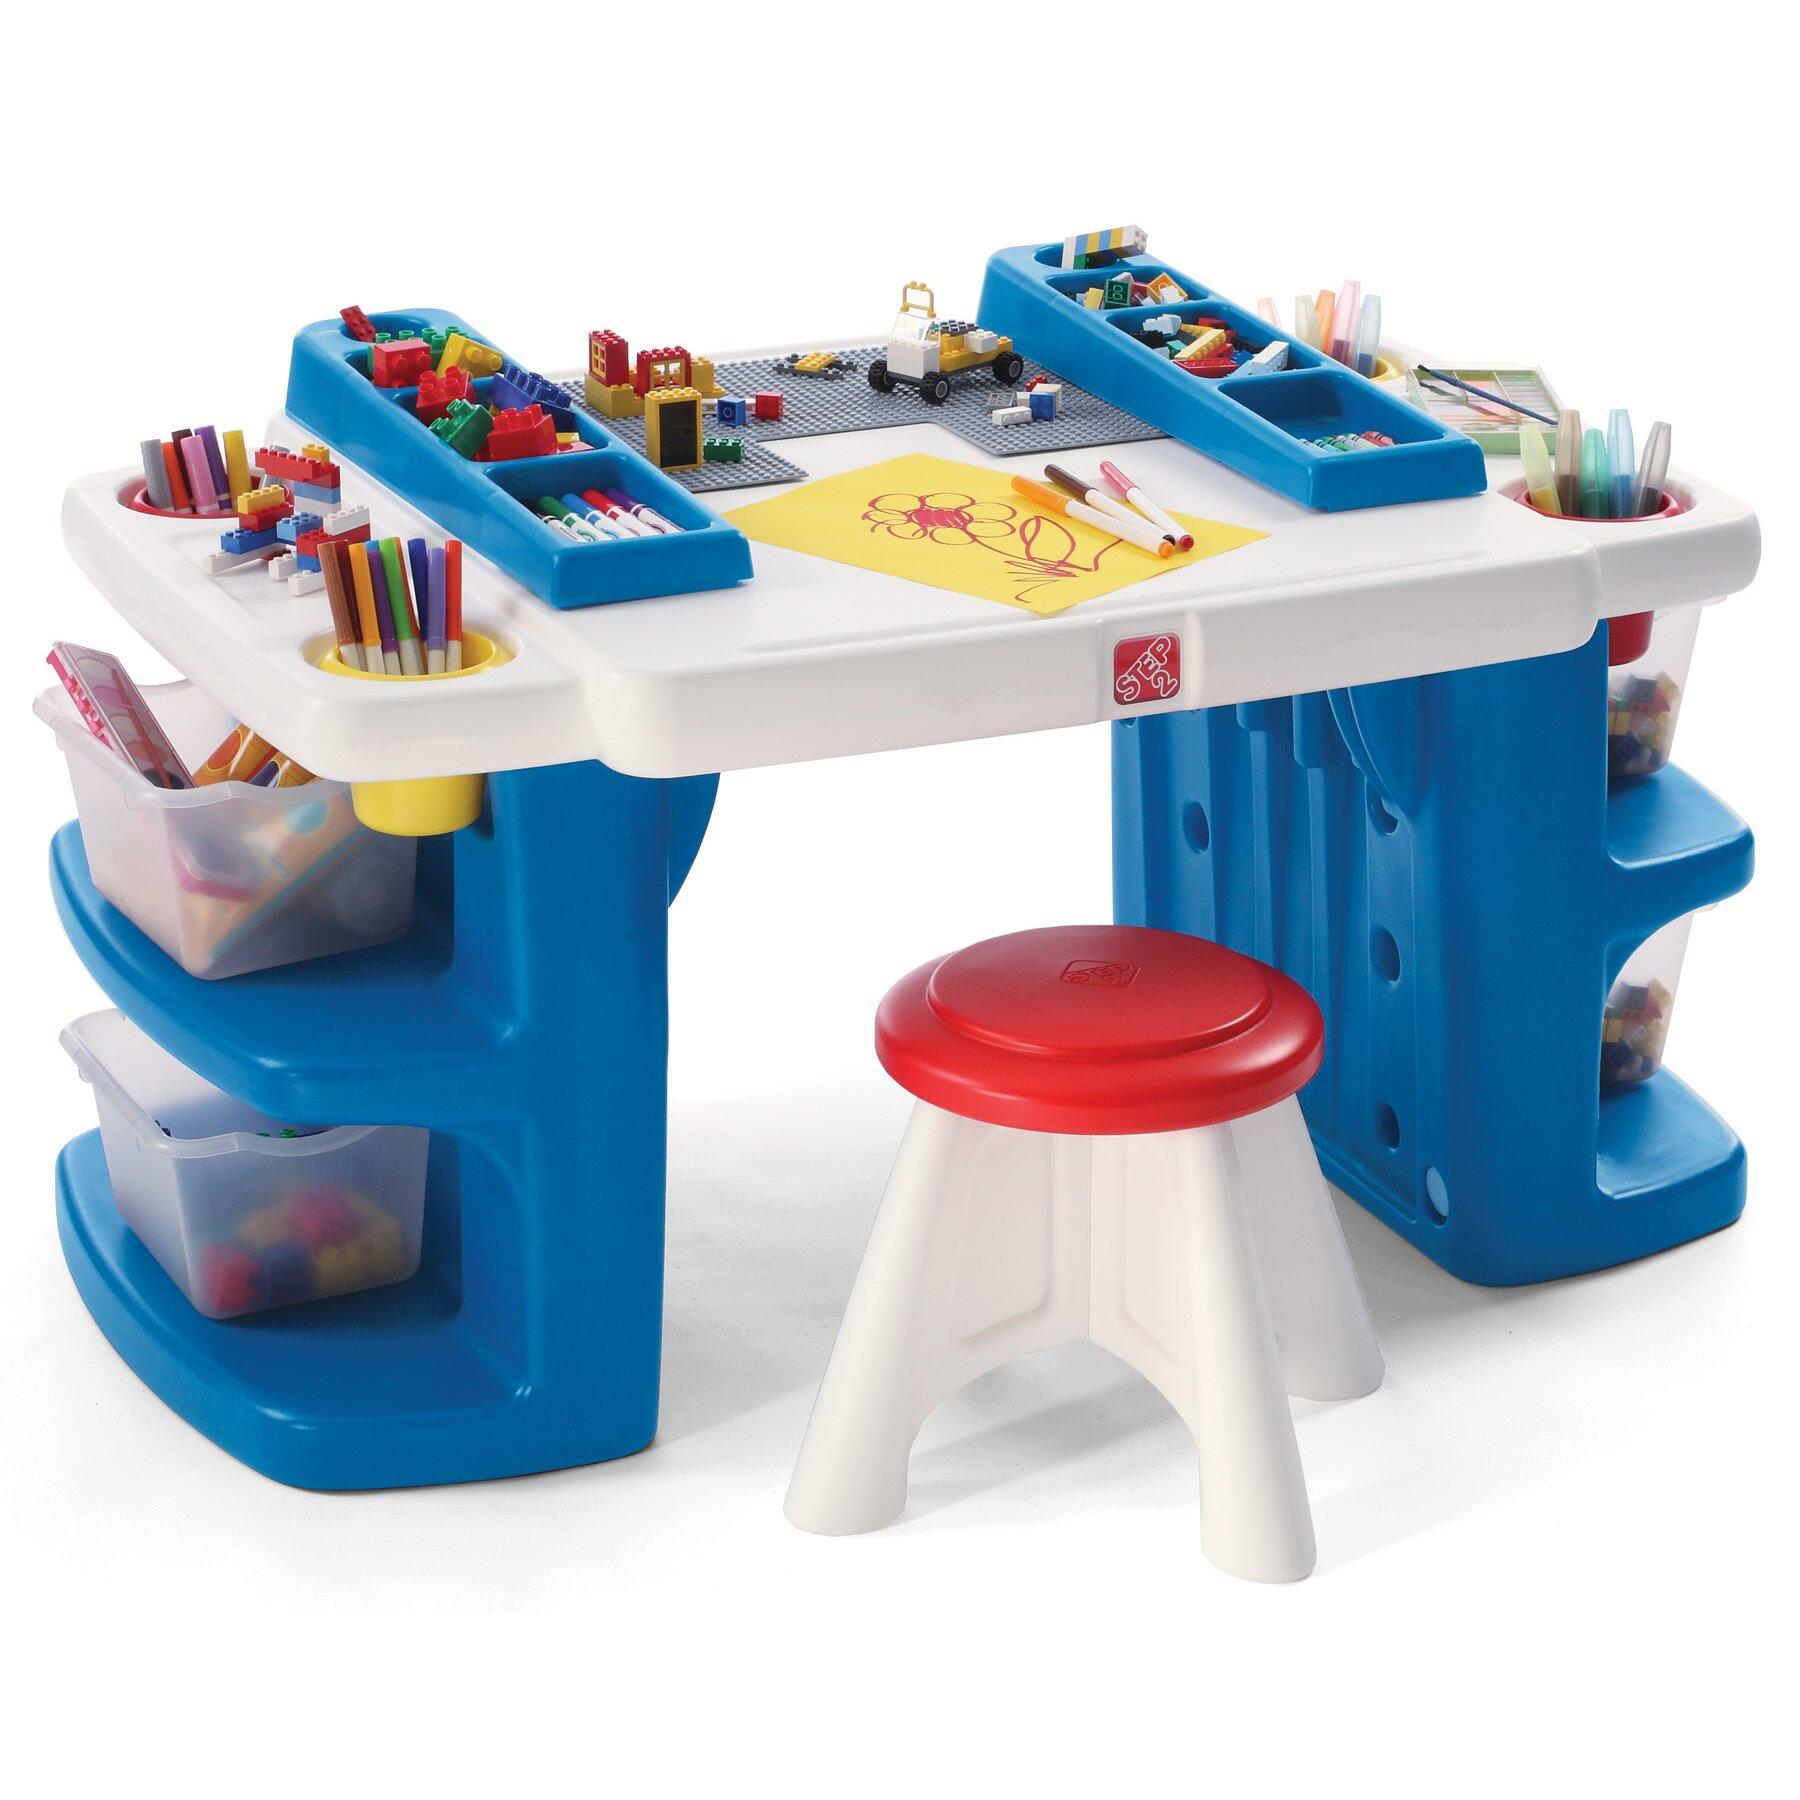 Игровые столики crayola, paradiso, simba, smoby, step 2 купи.